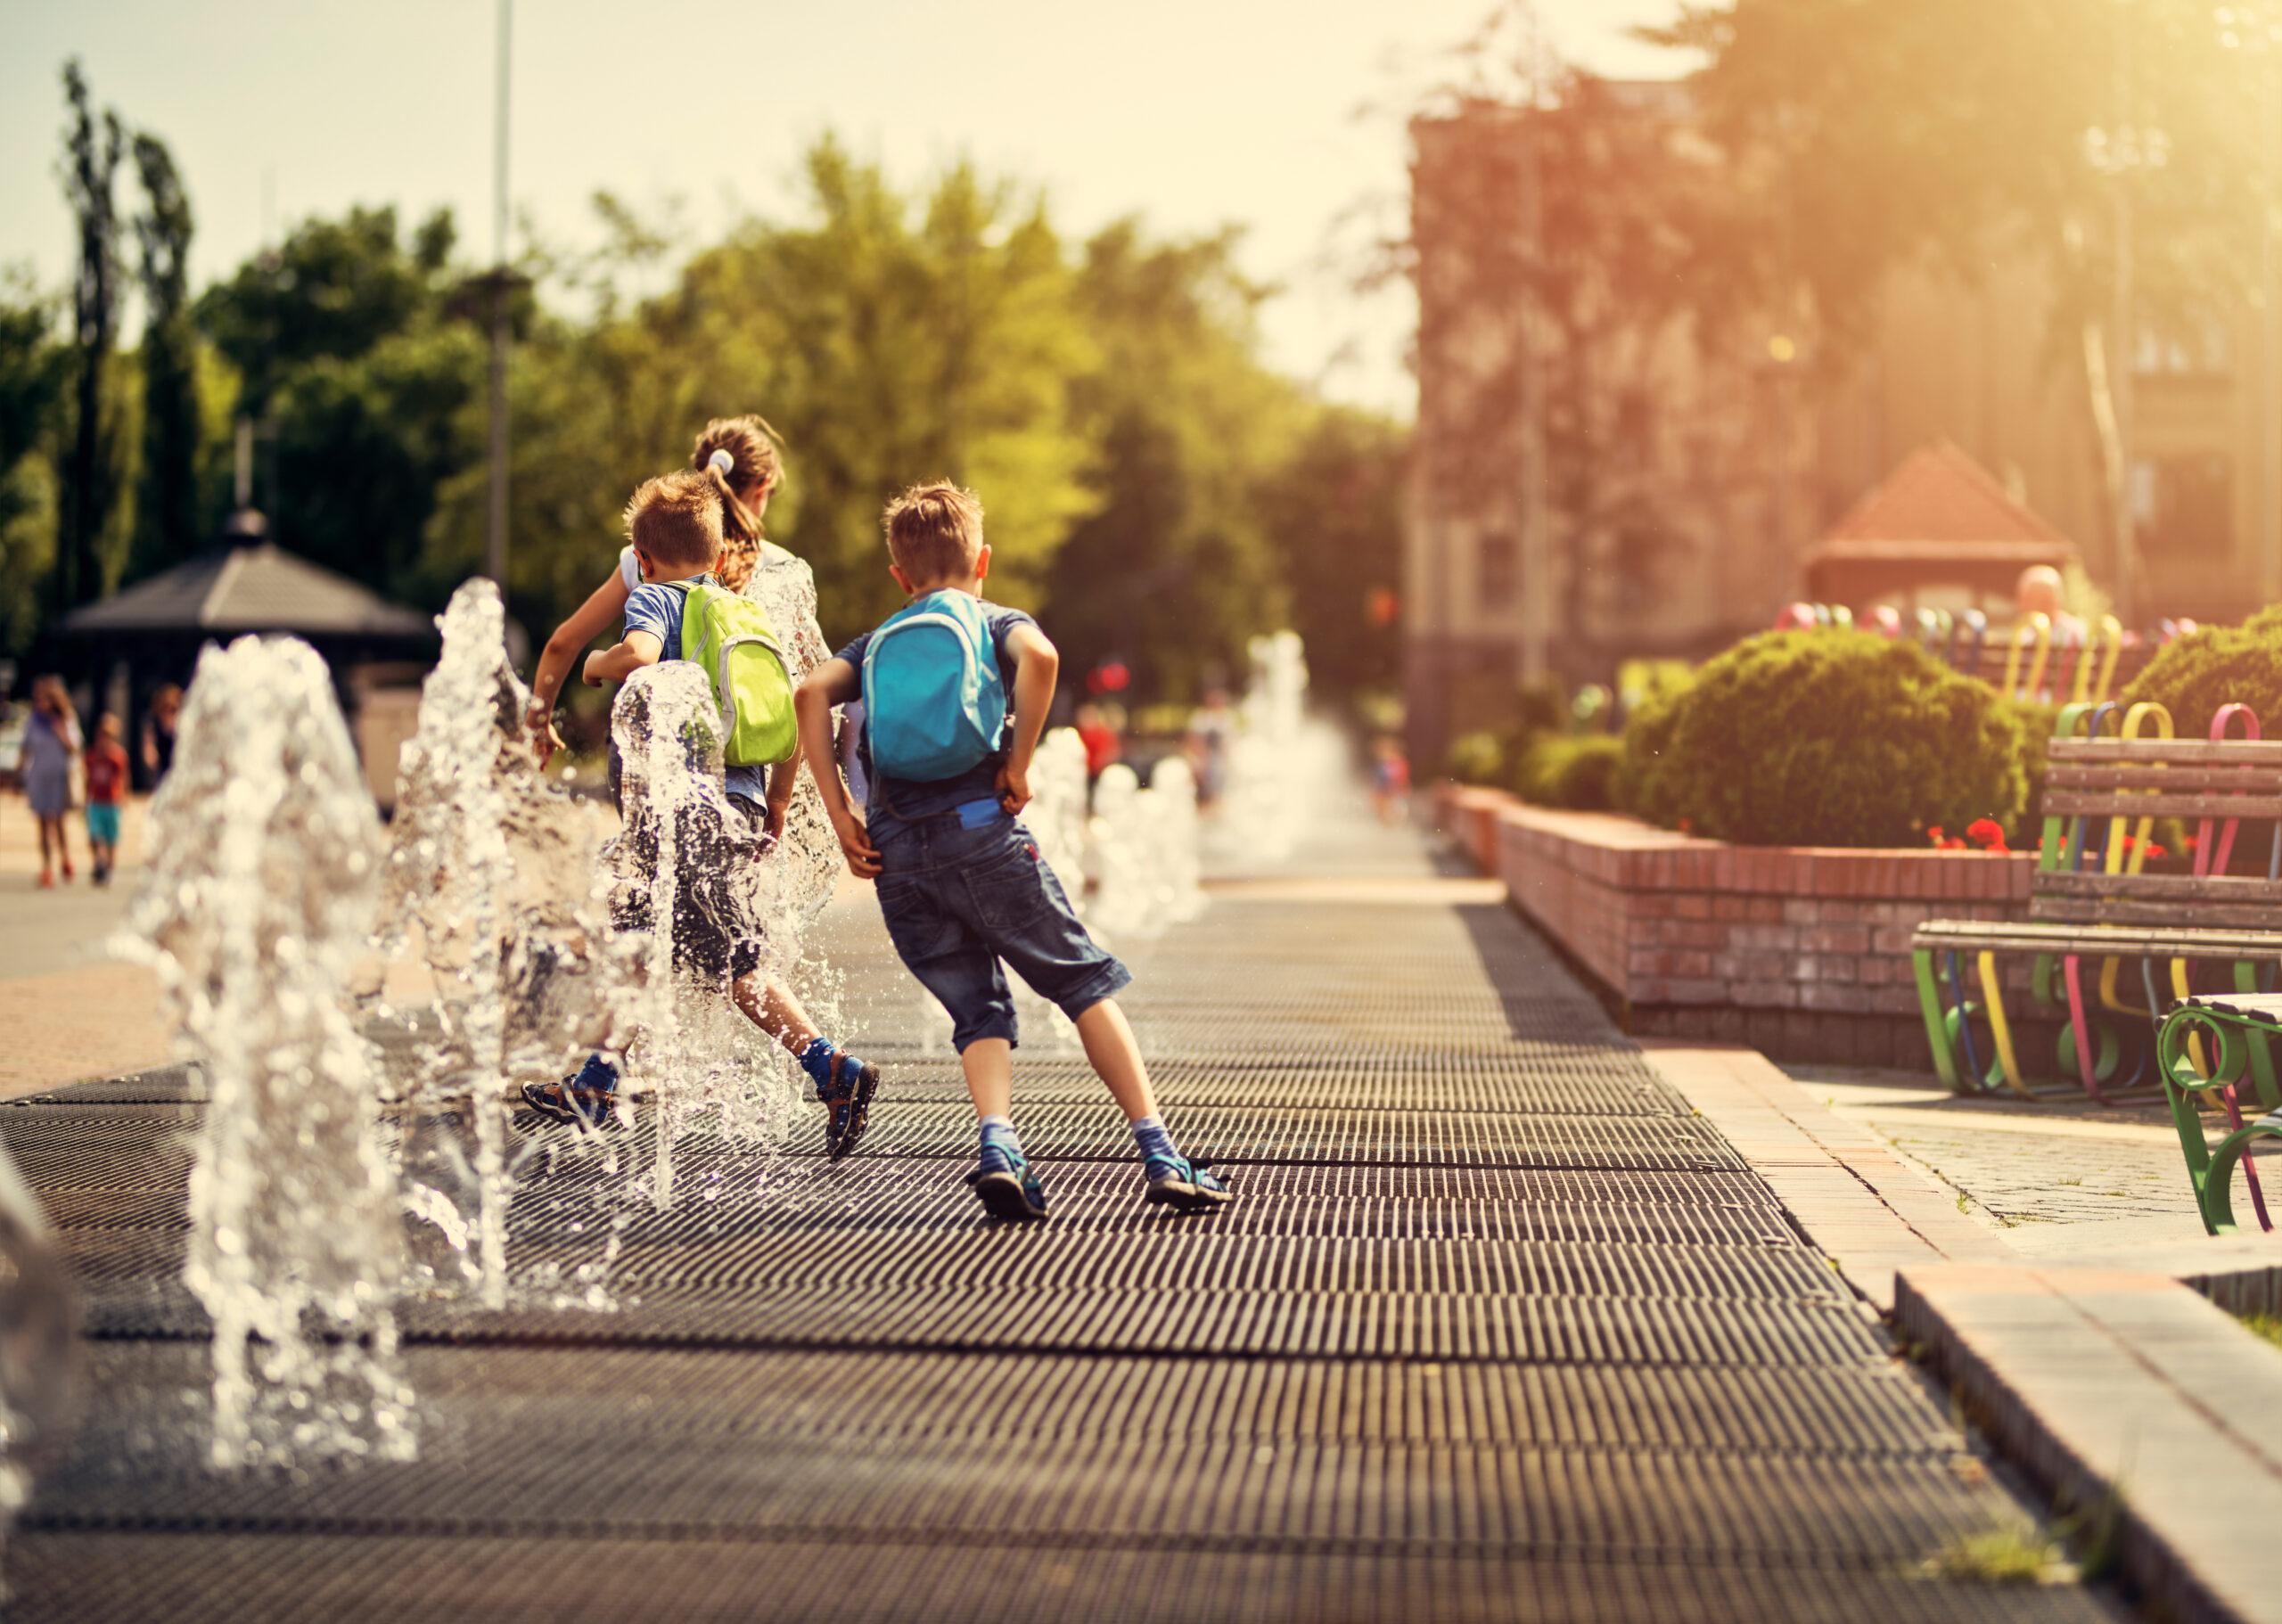 Kids running between fountains on a hot summer day.